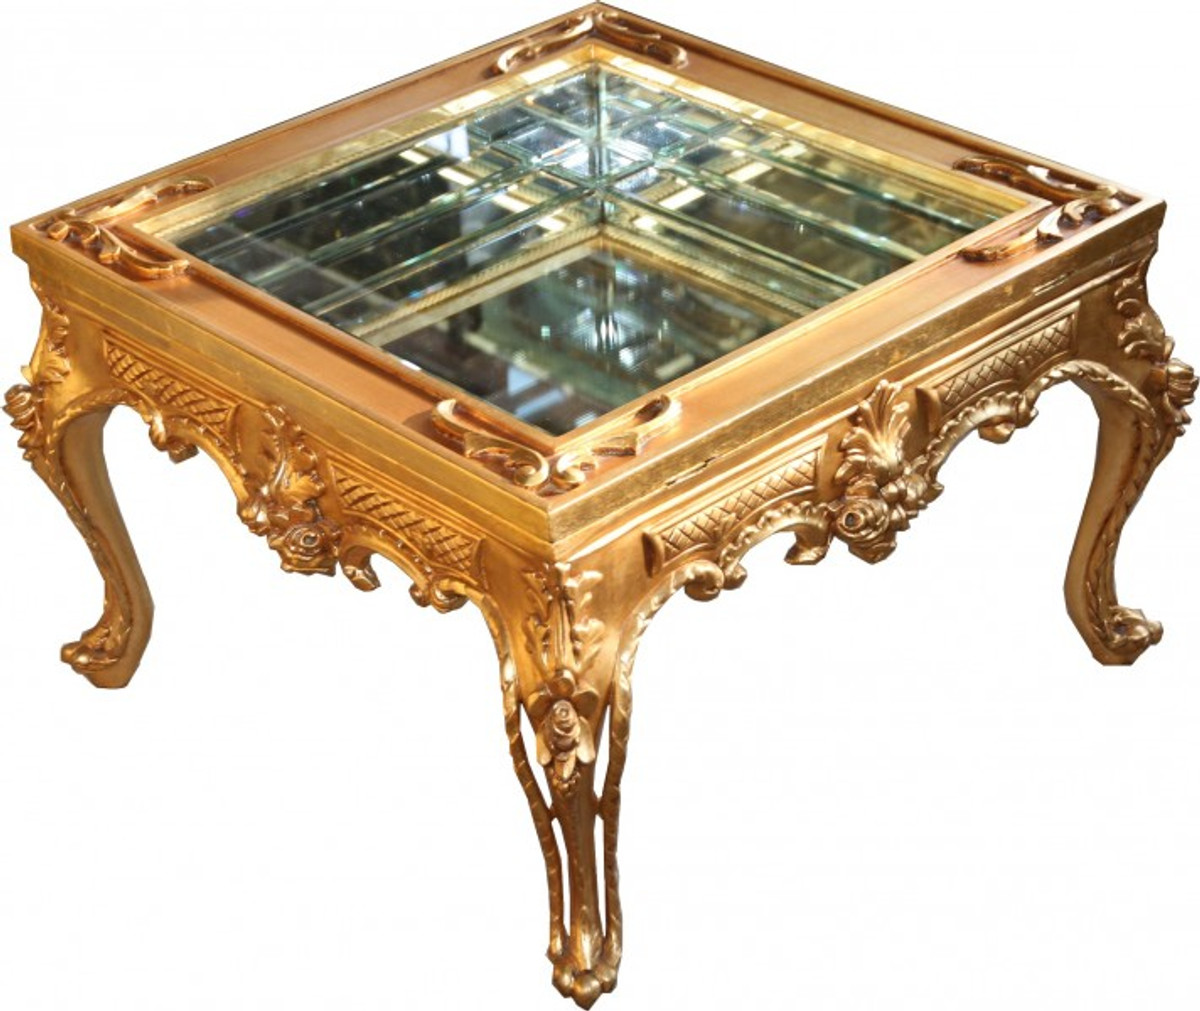 Prunkvoller casa padrino barock couchtisch gold for Couchtisch gold